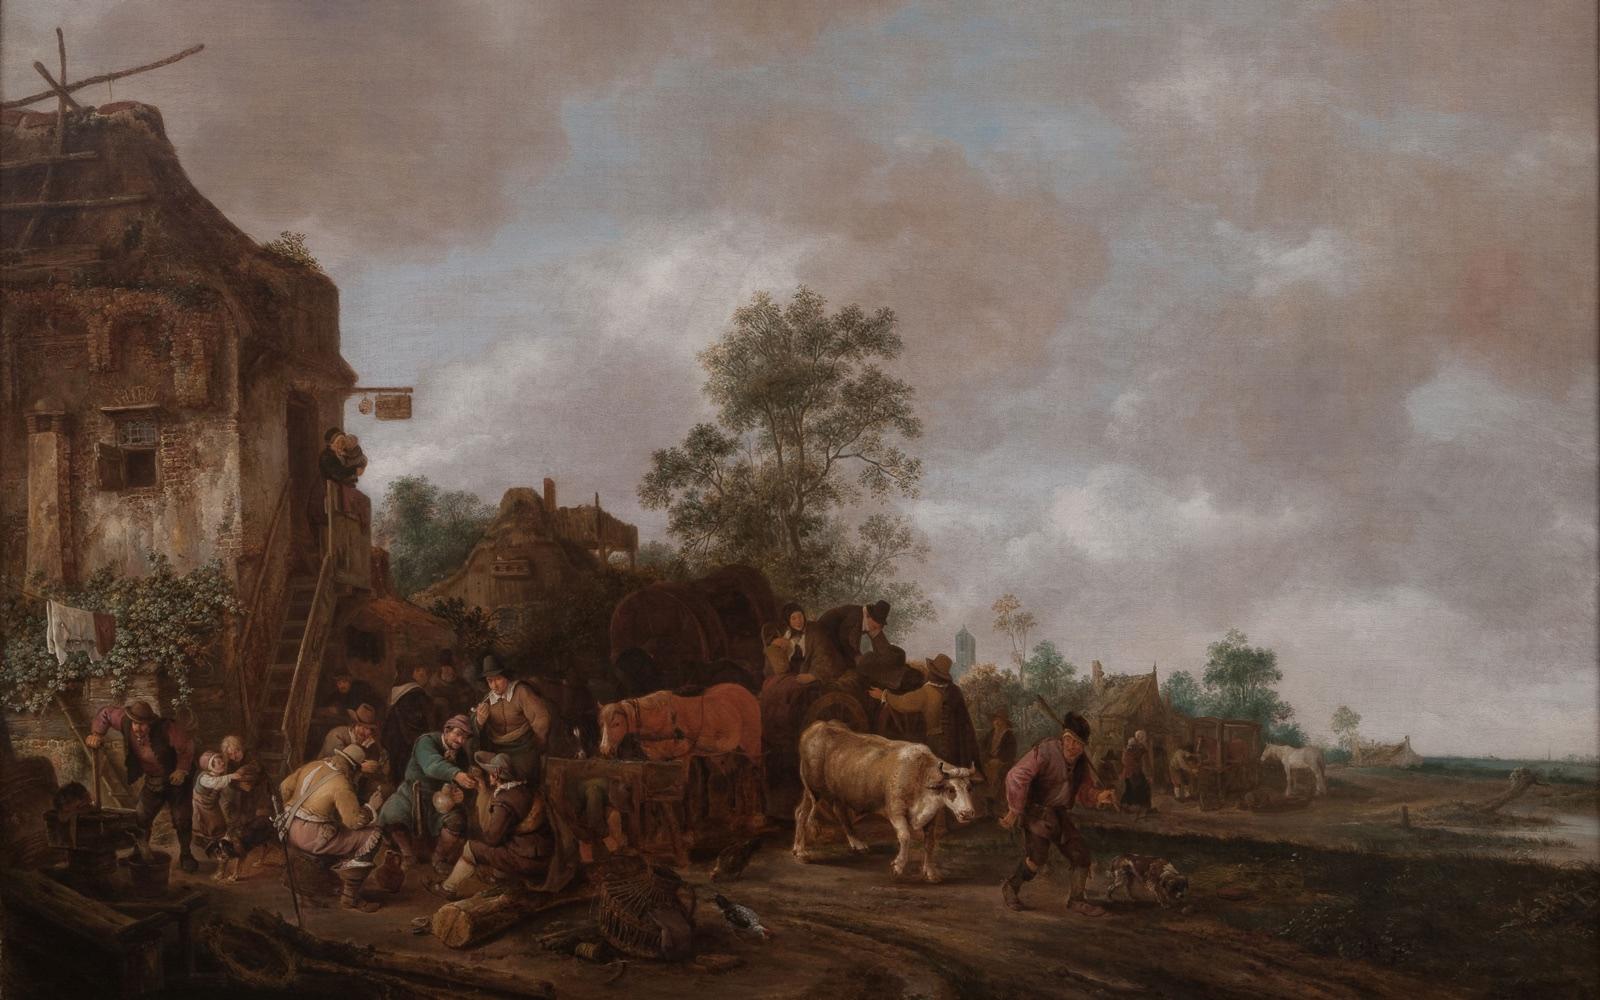 Figuras afuera de una posada (1647), de Isack van Ostade